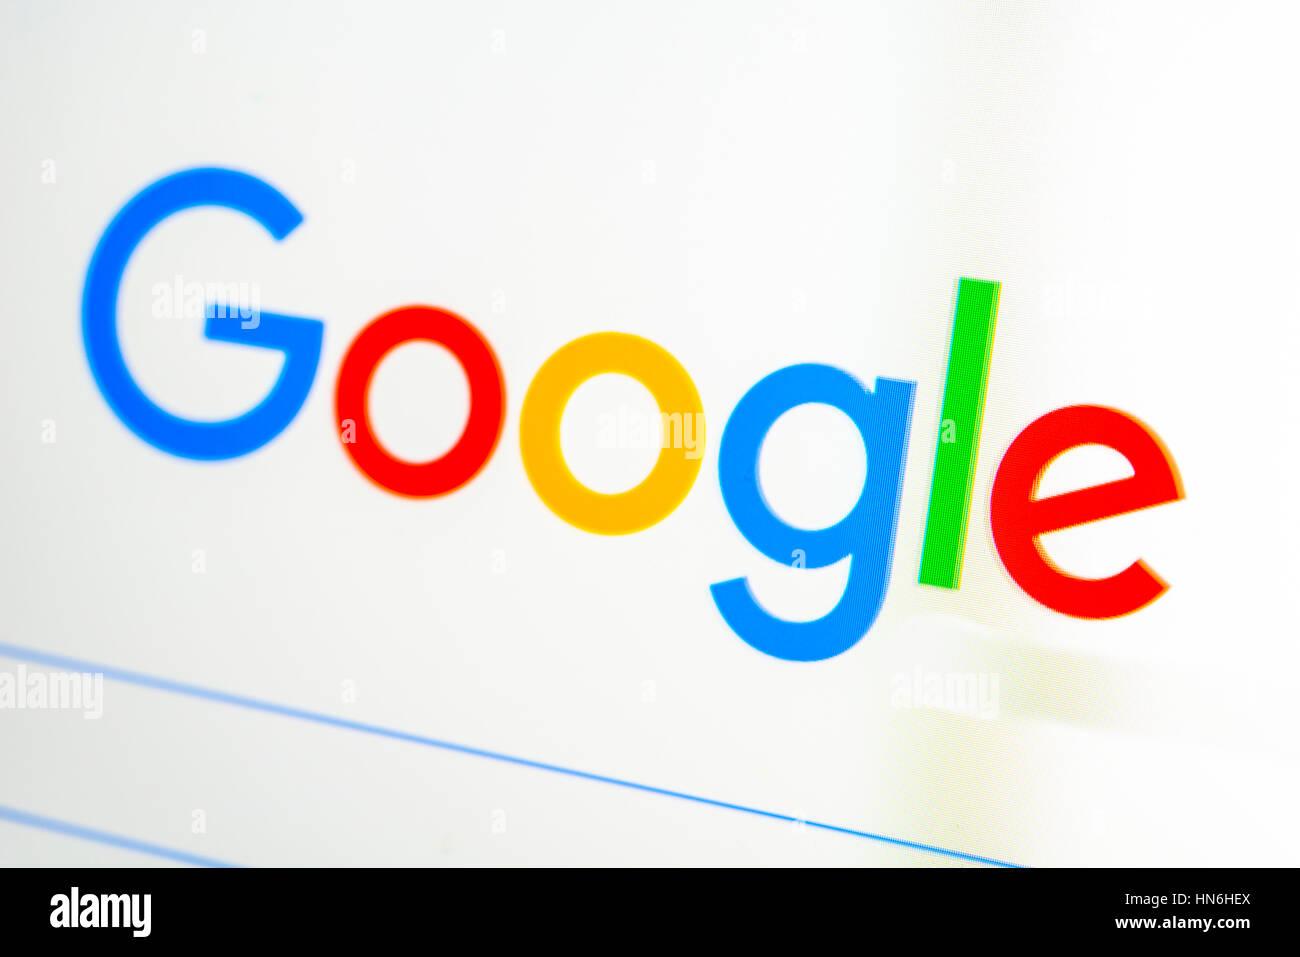 Google, Homepage, Search Engine, Internet, Screenshot - Stock Image